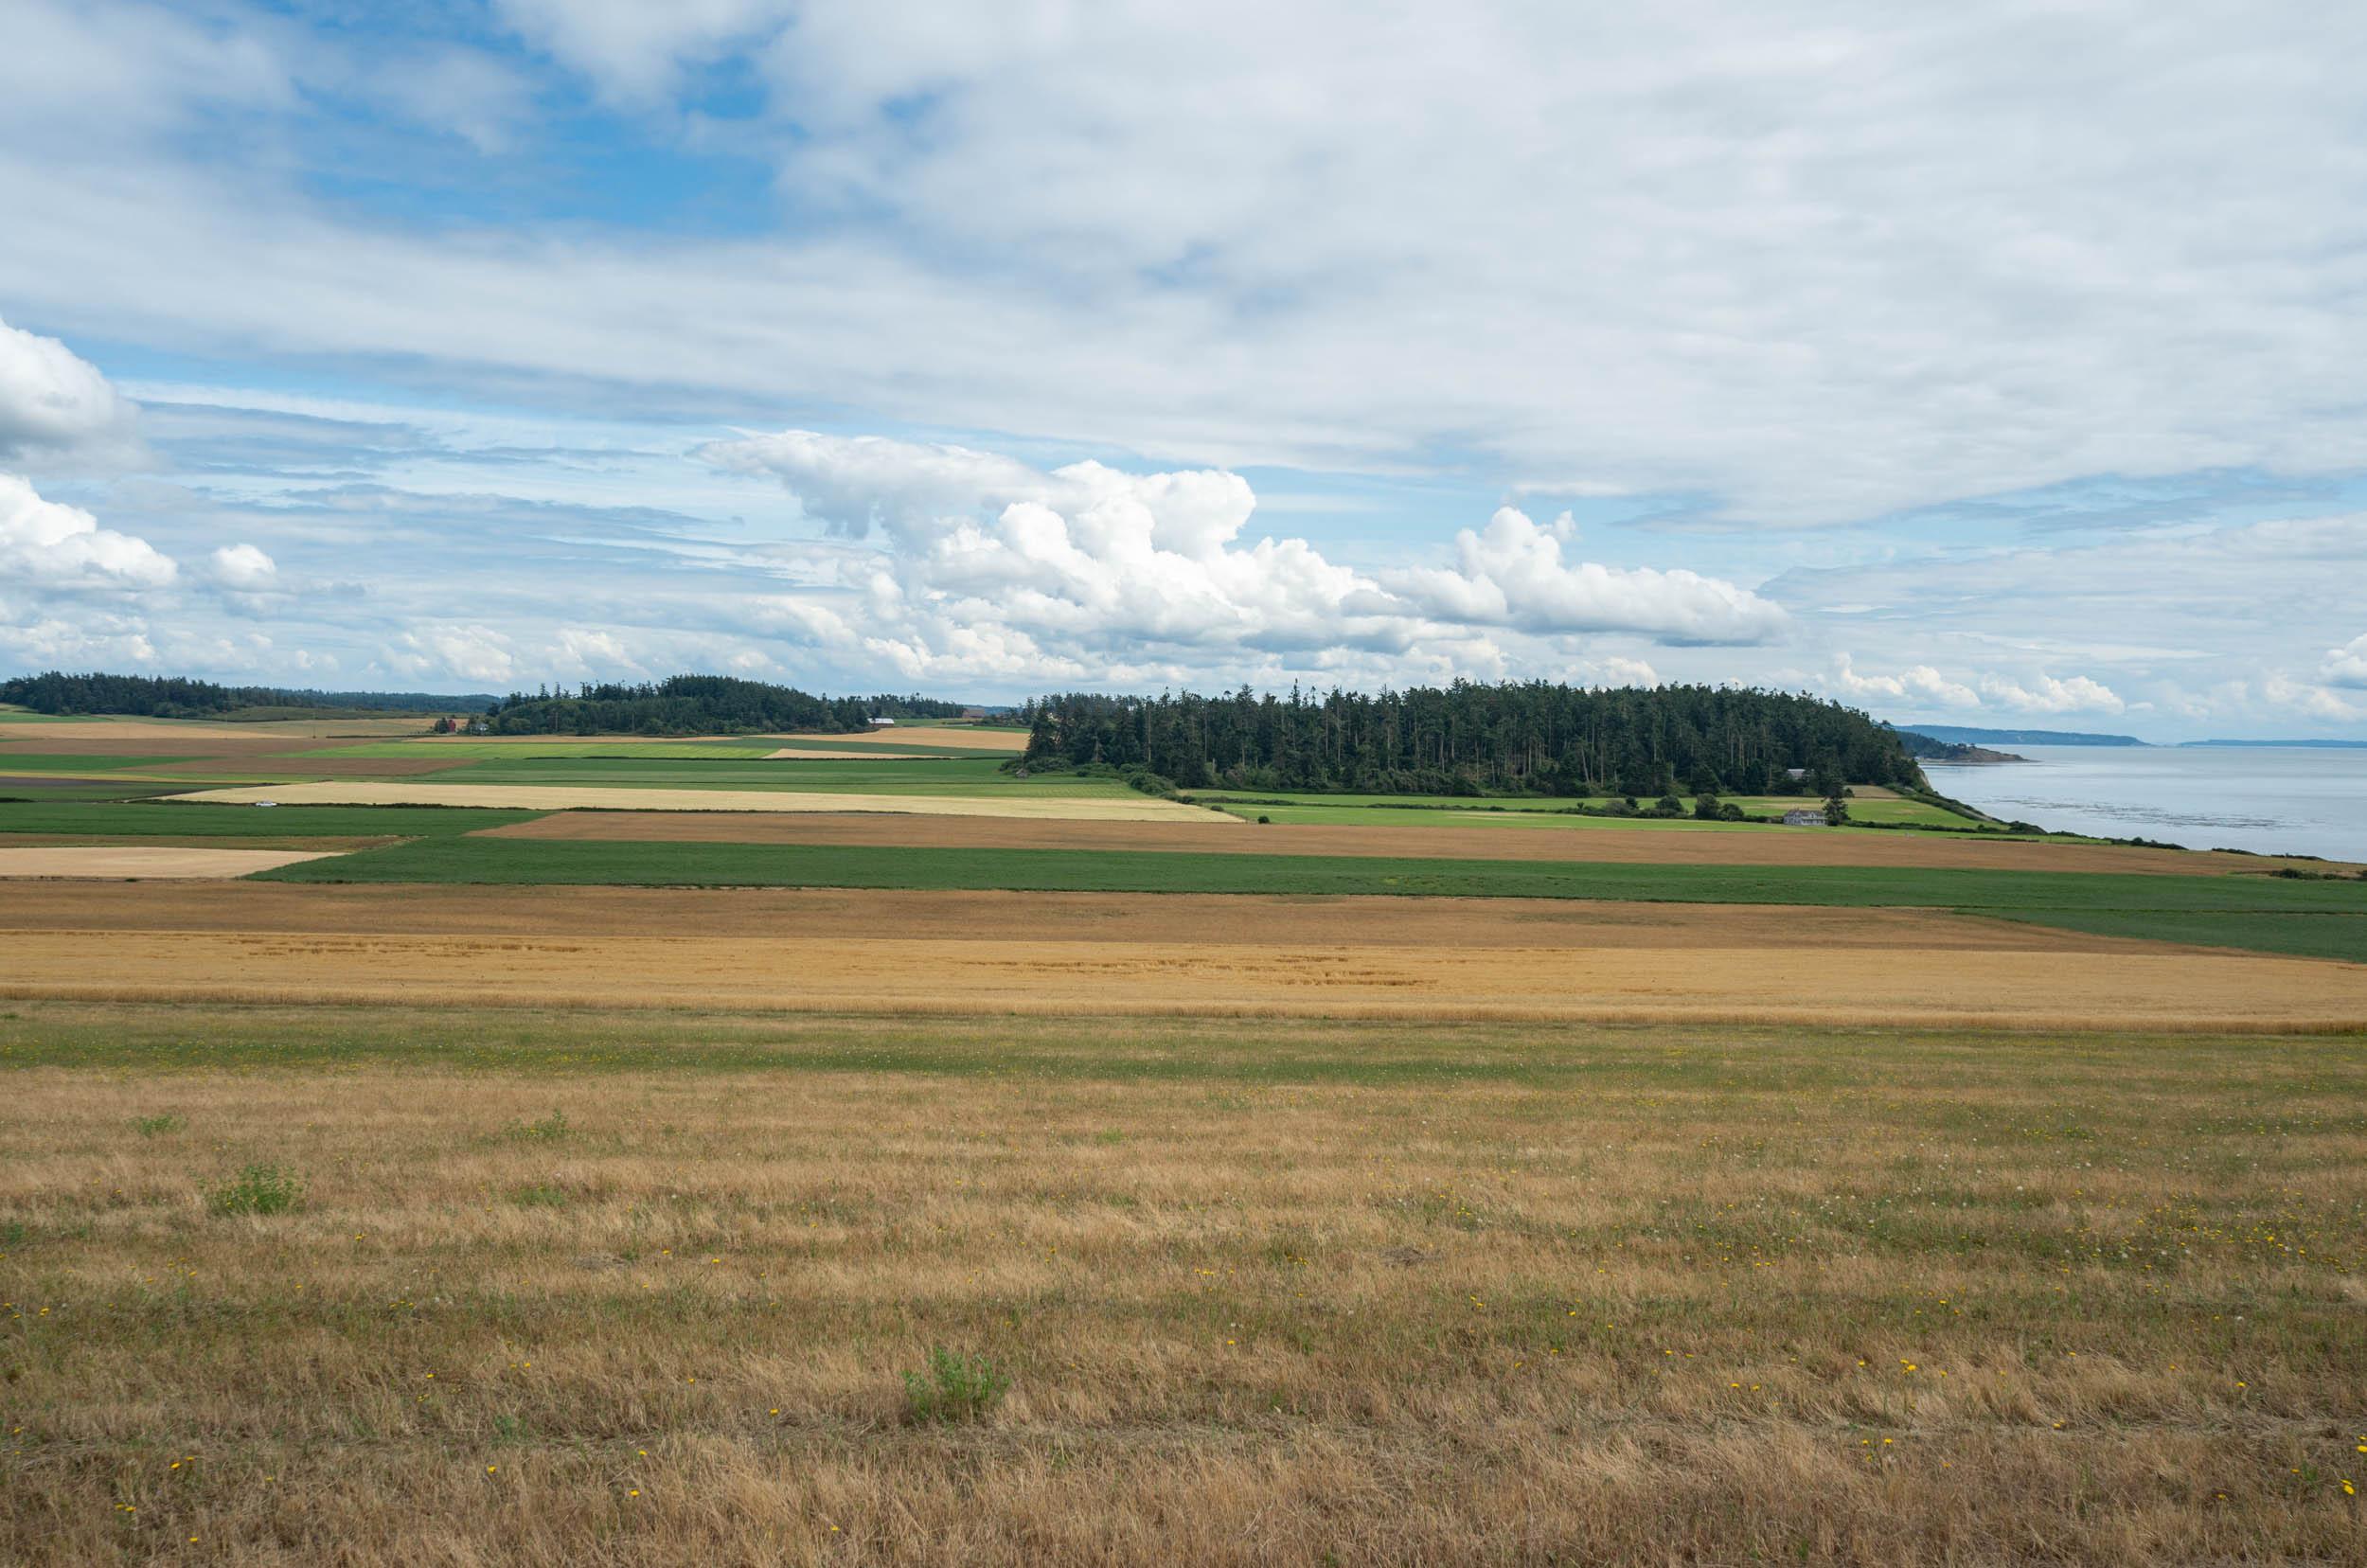 Whidbey farm